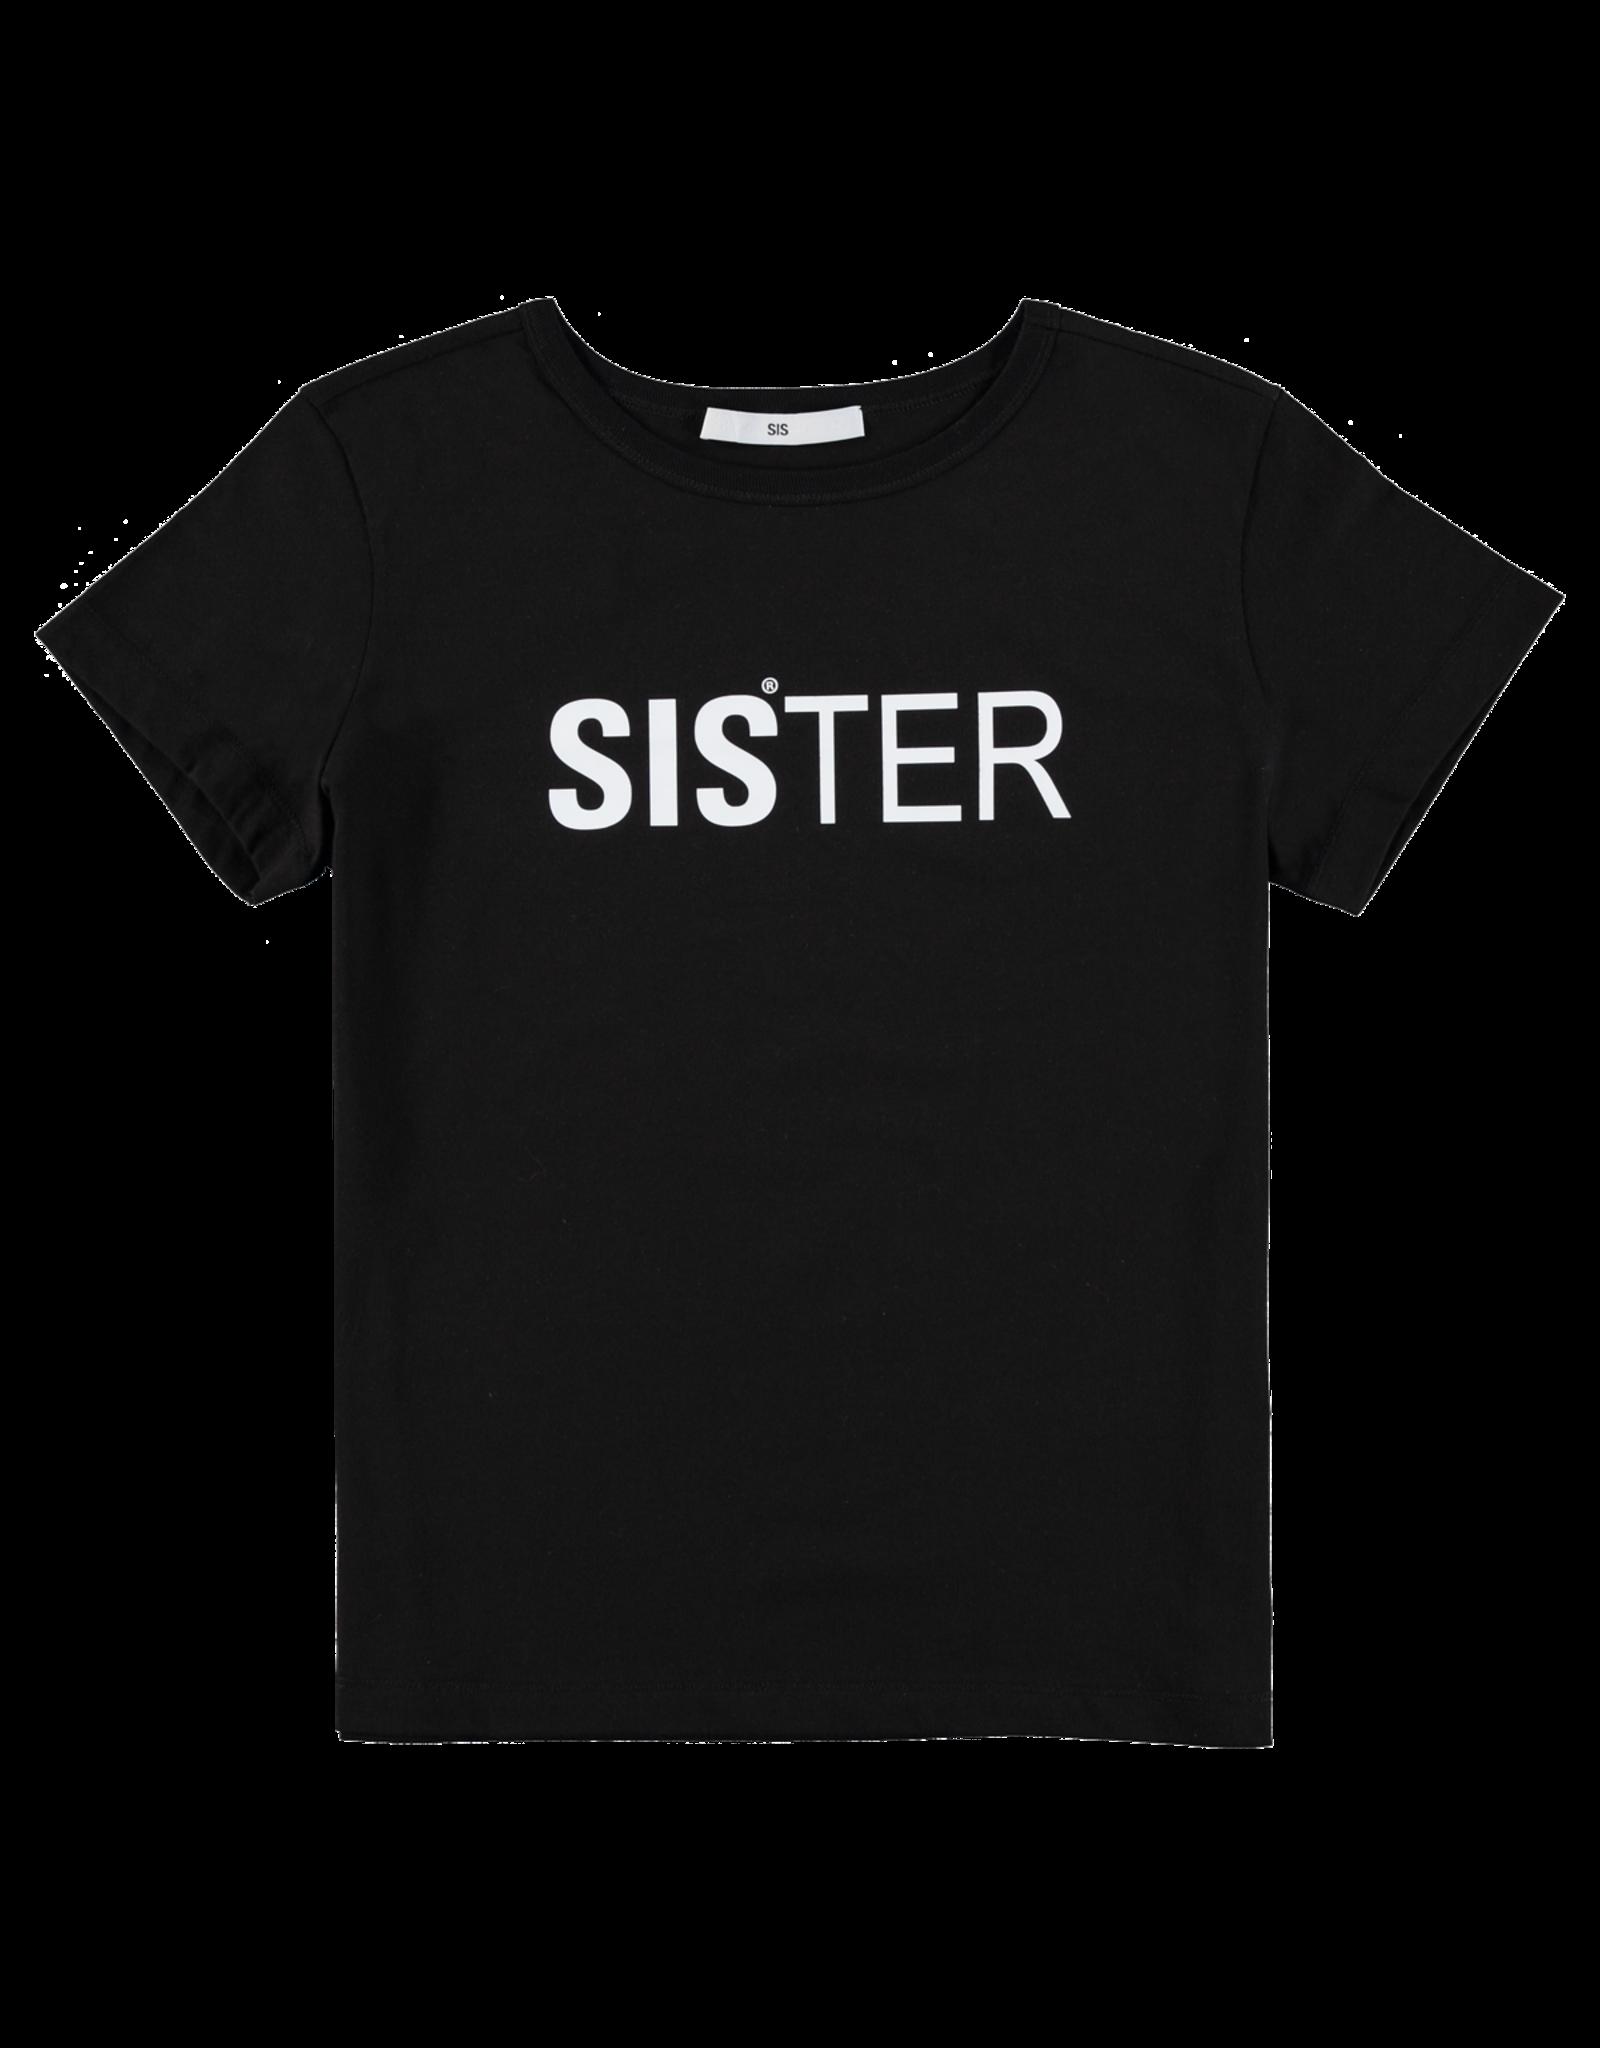 AW1819-715 SISTER T-SHIRT